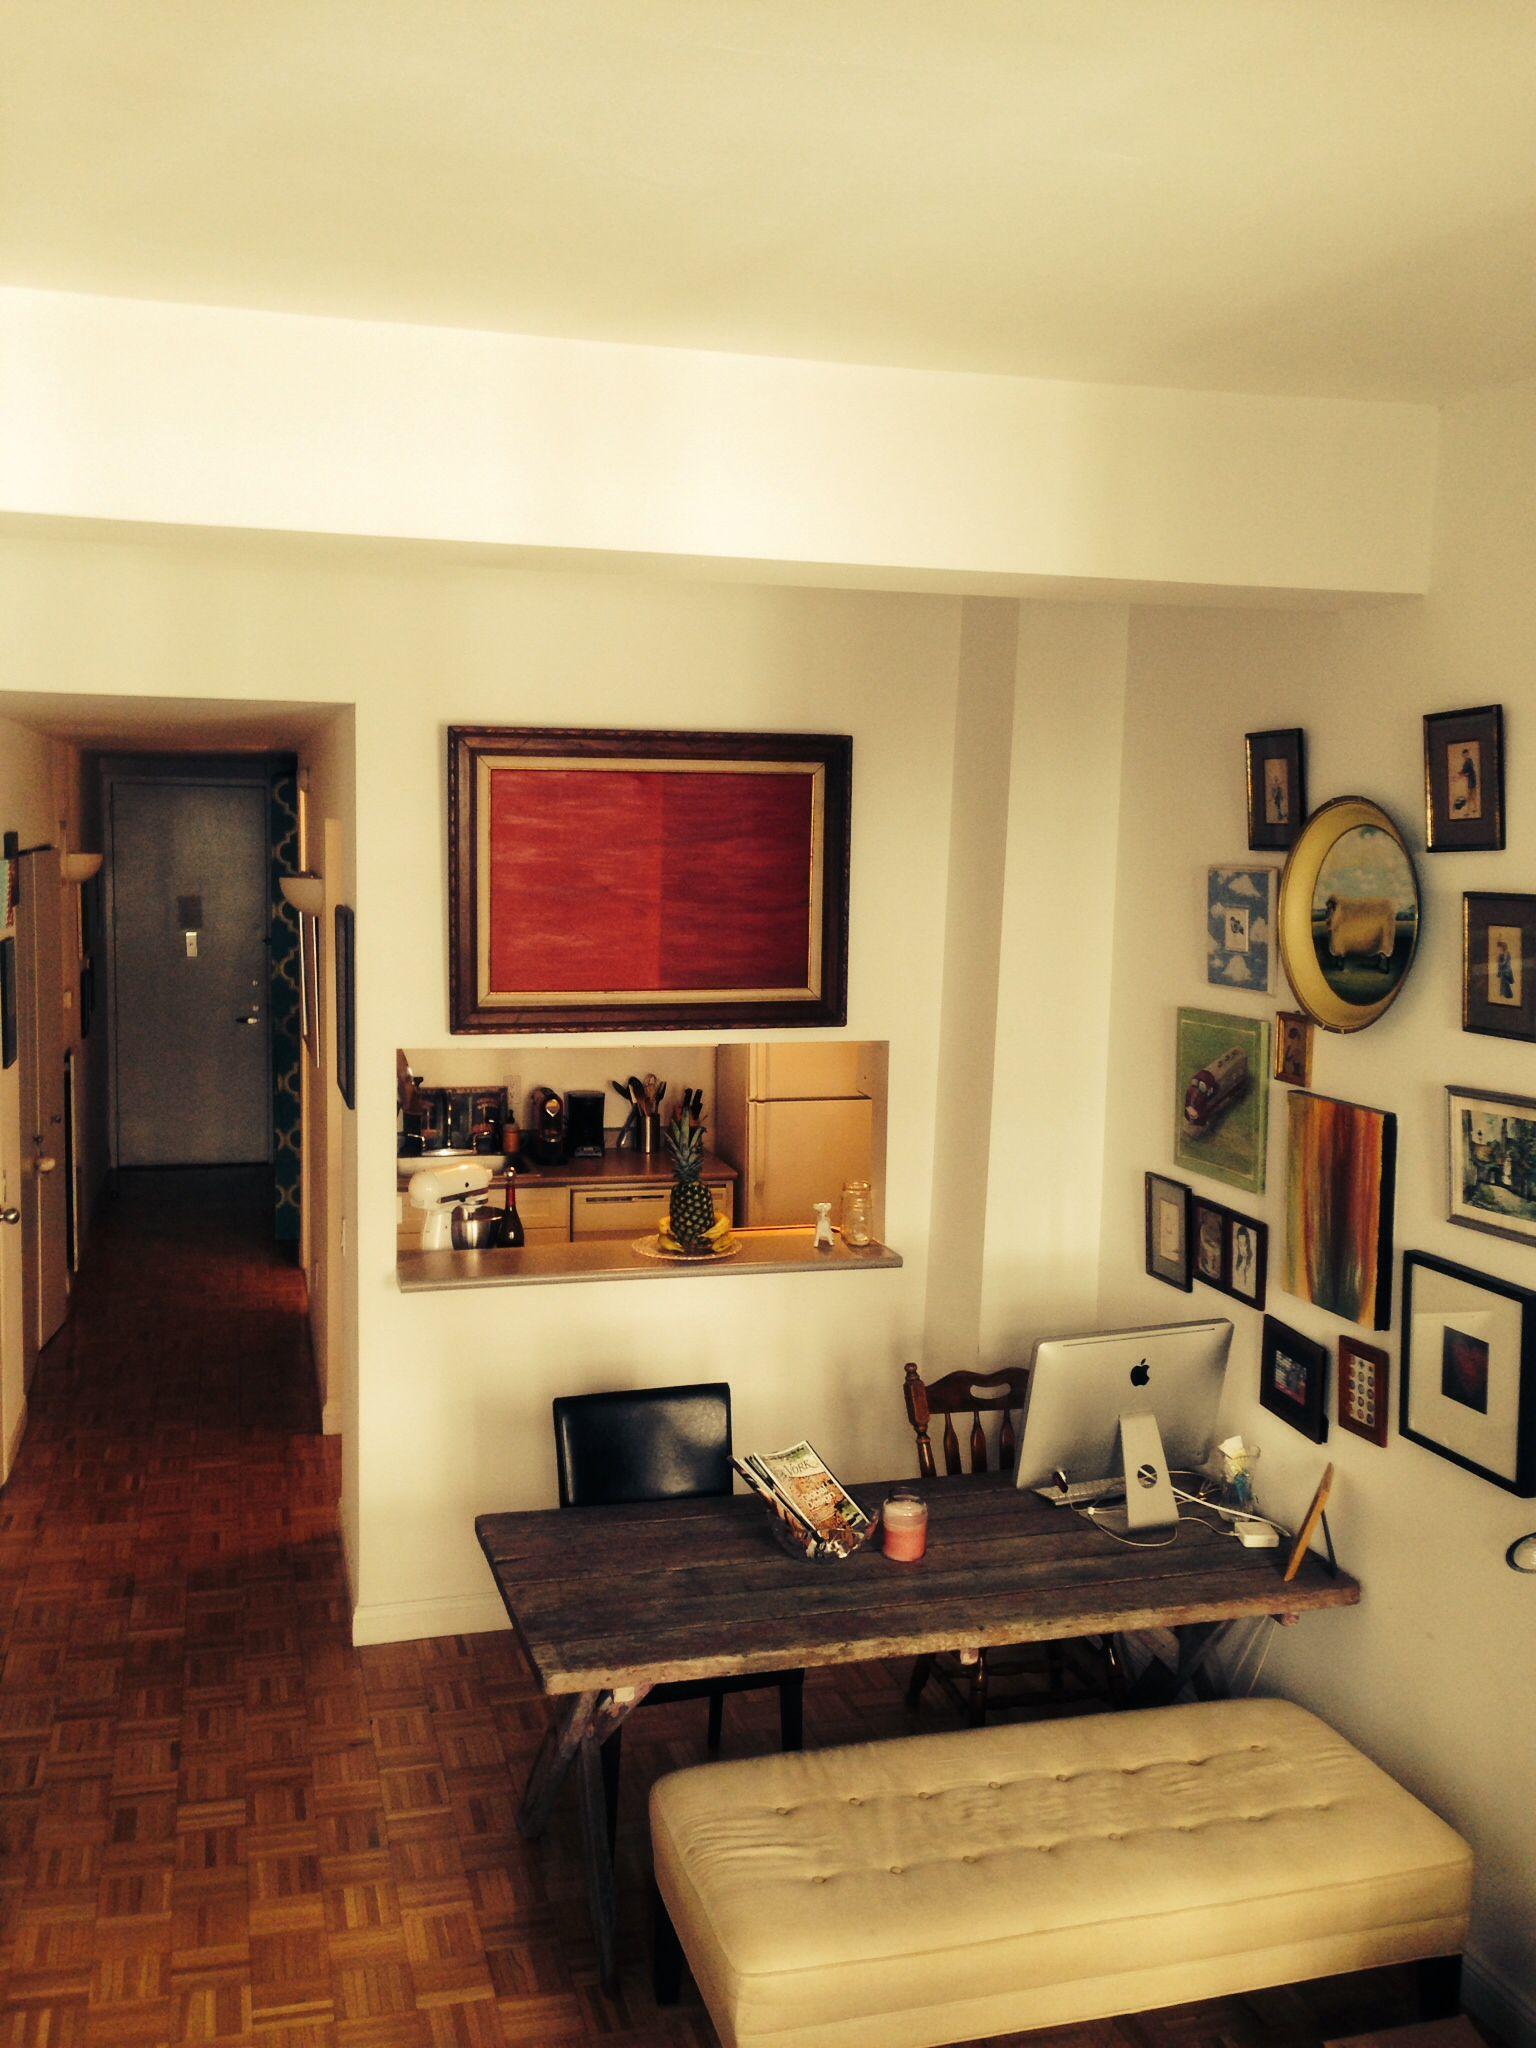 Railroad kitchen, NY Kitchen, wallpaper in kitchen, ideas for ...